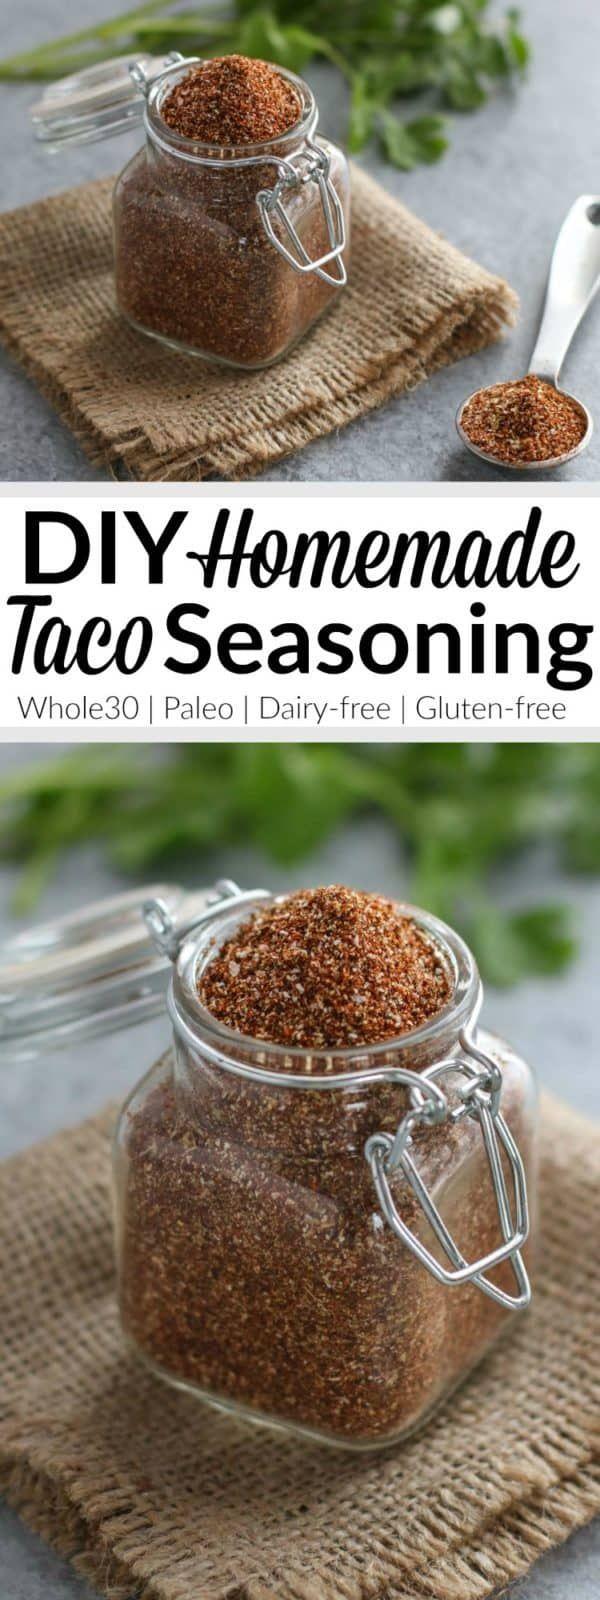 Homemade Taco Seasoning (Whole30)